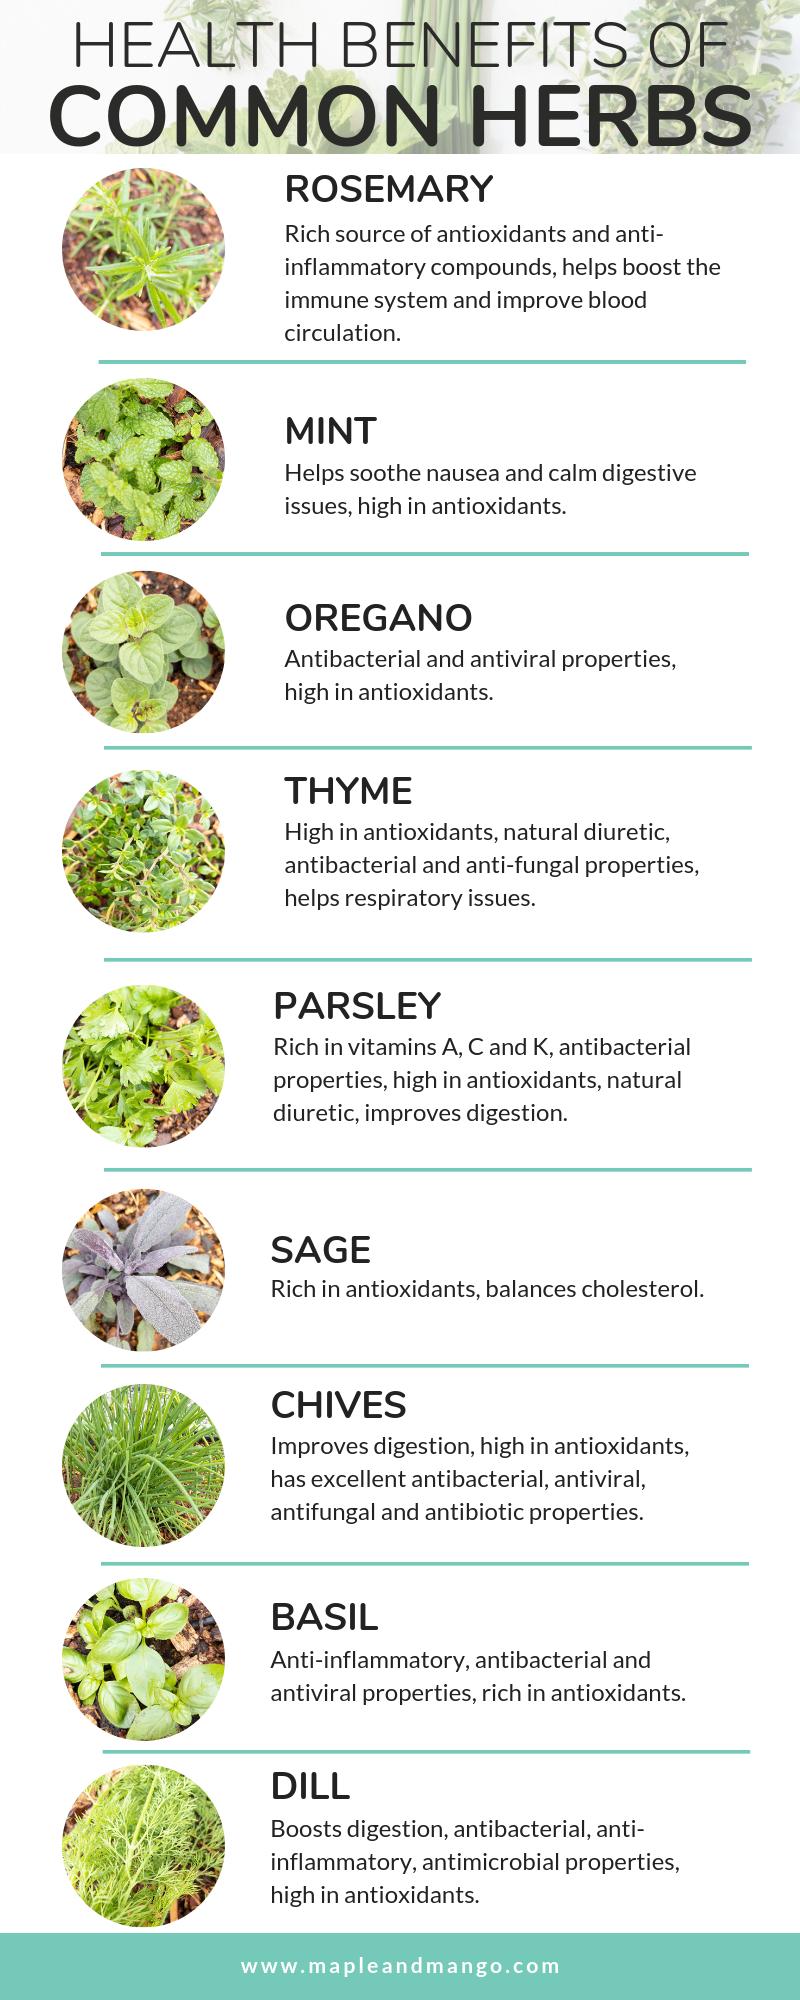 Growing a Herb Garden + Health Benefits of Herbs